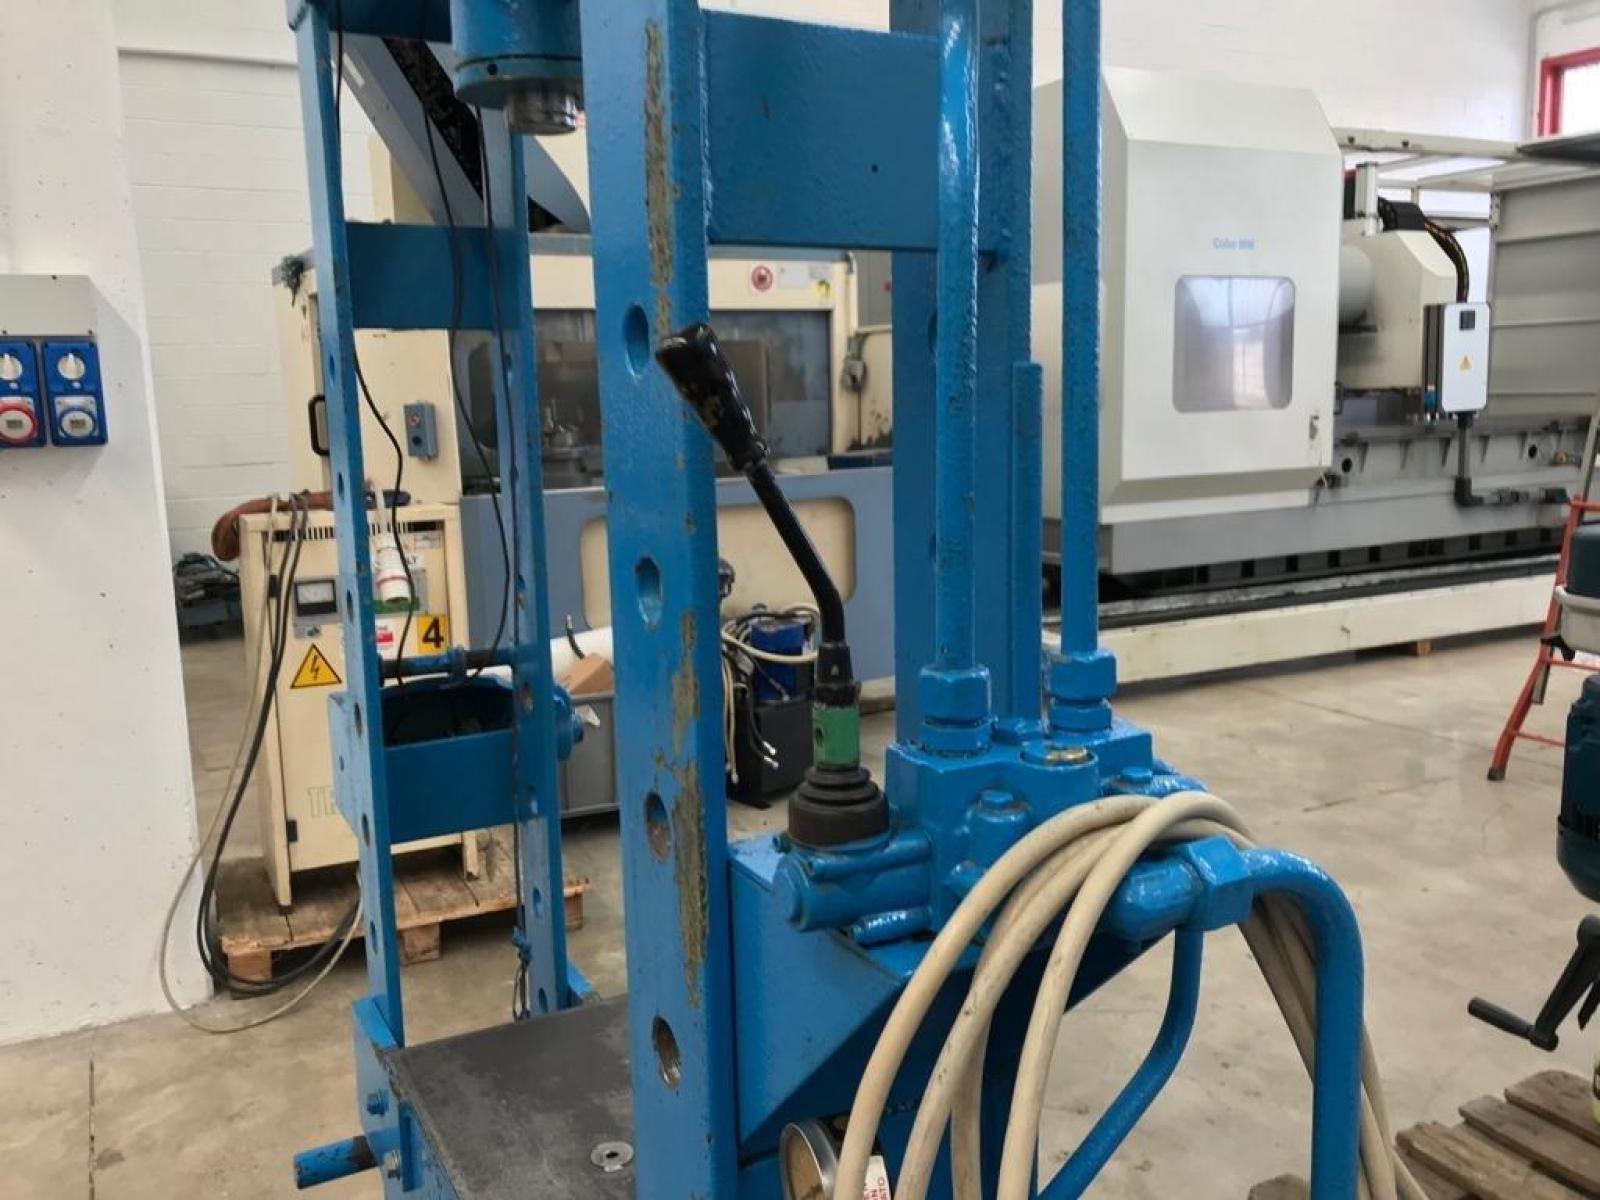 Pressa idraulica per officina for Pressa idraulica per officina usata